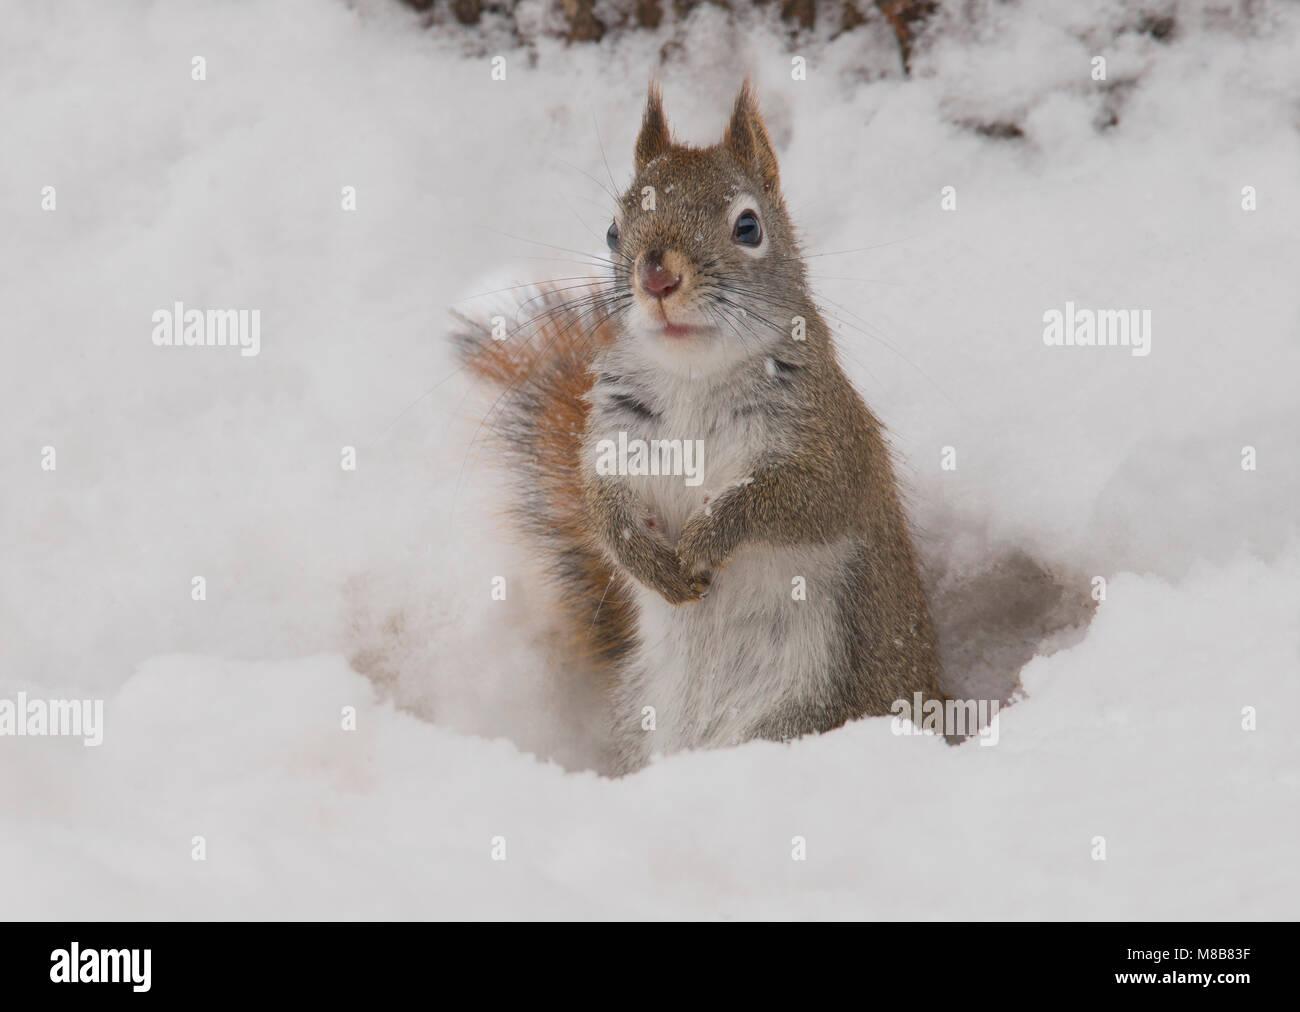 Ardilla Roja americana (Tamiasciurus hudsonicus), Invierno, E EE.UU., por omitir Moody/Dembinsky Foto Assoc Imagen De Stock